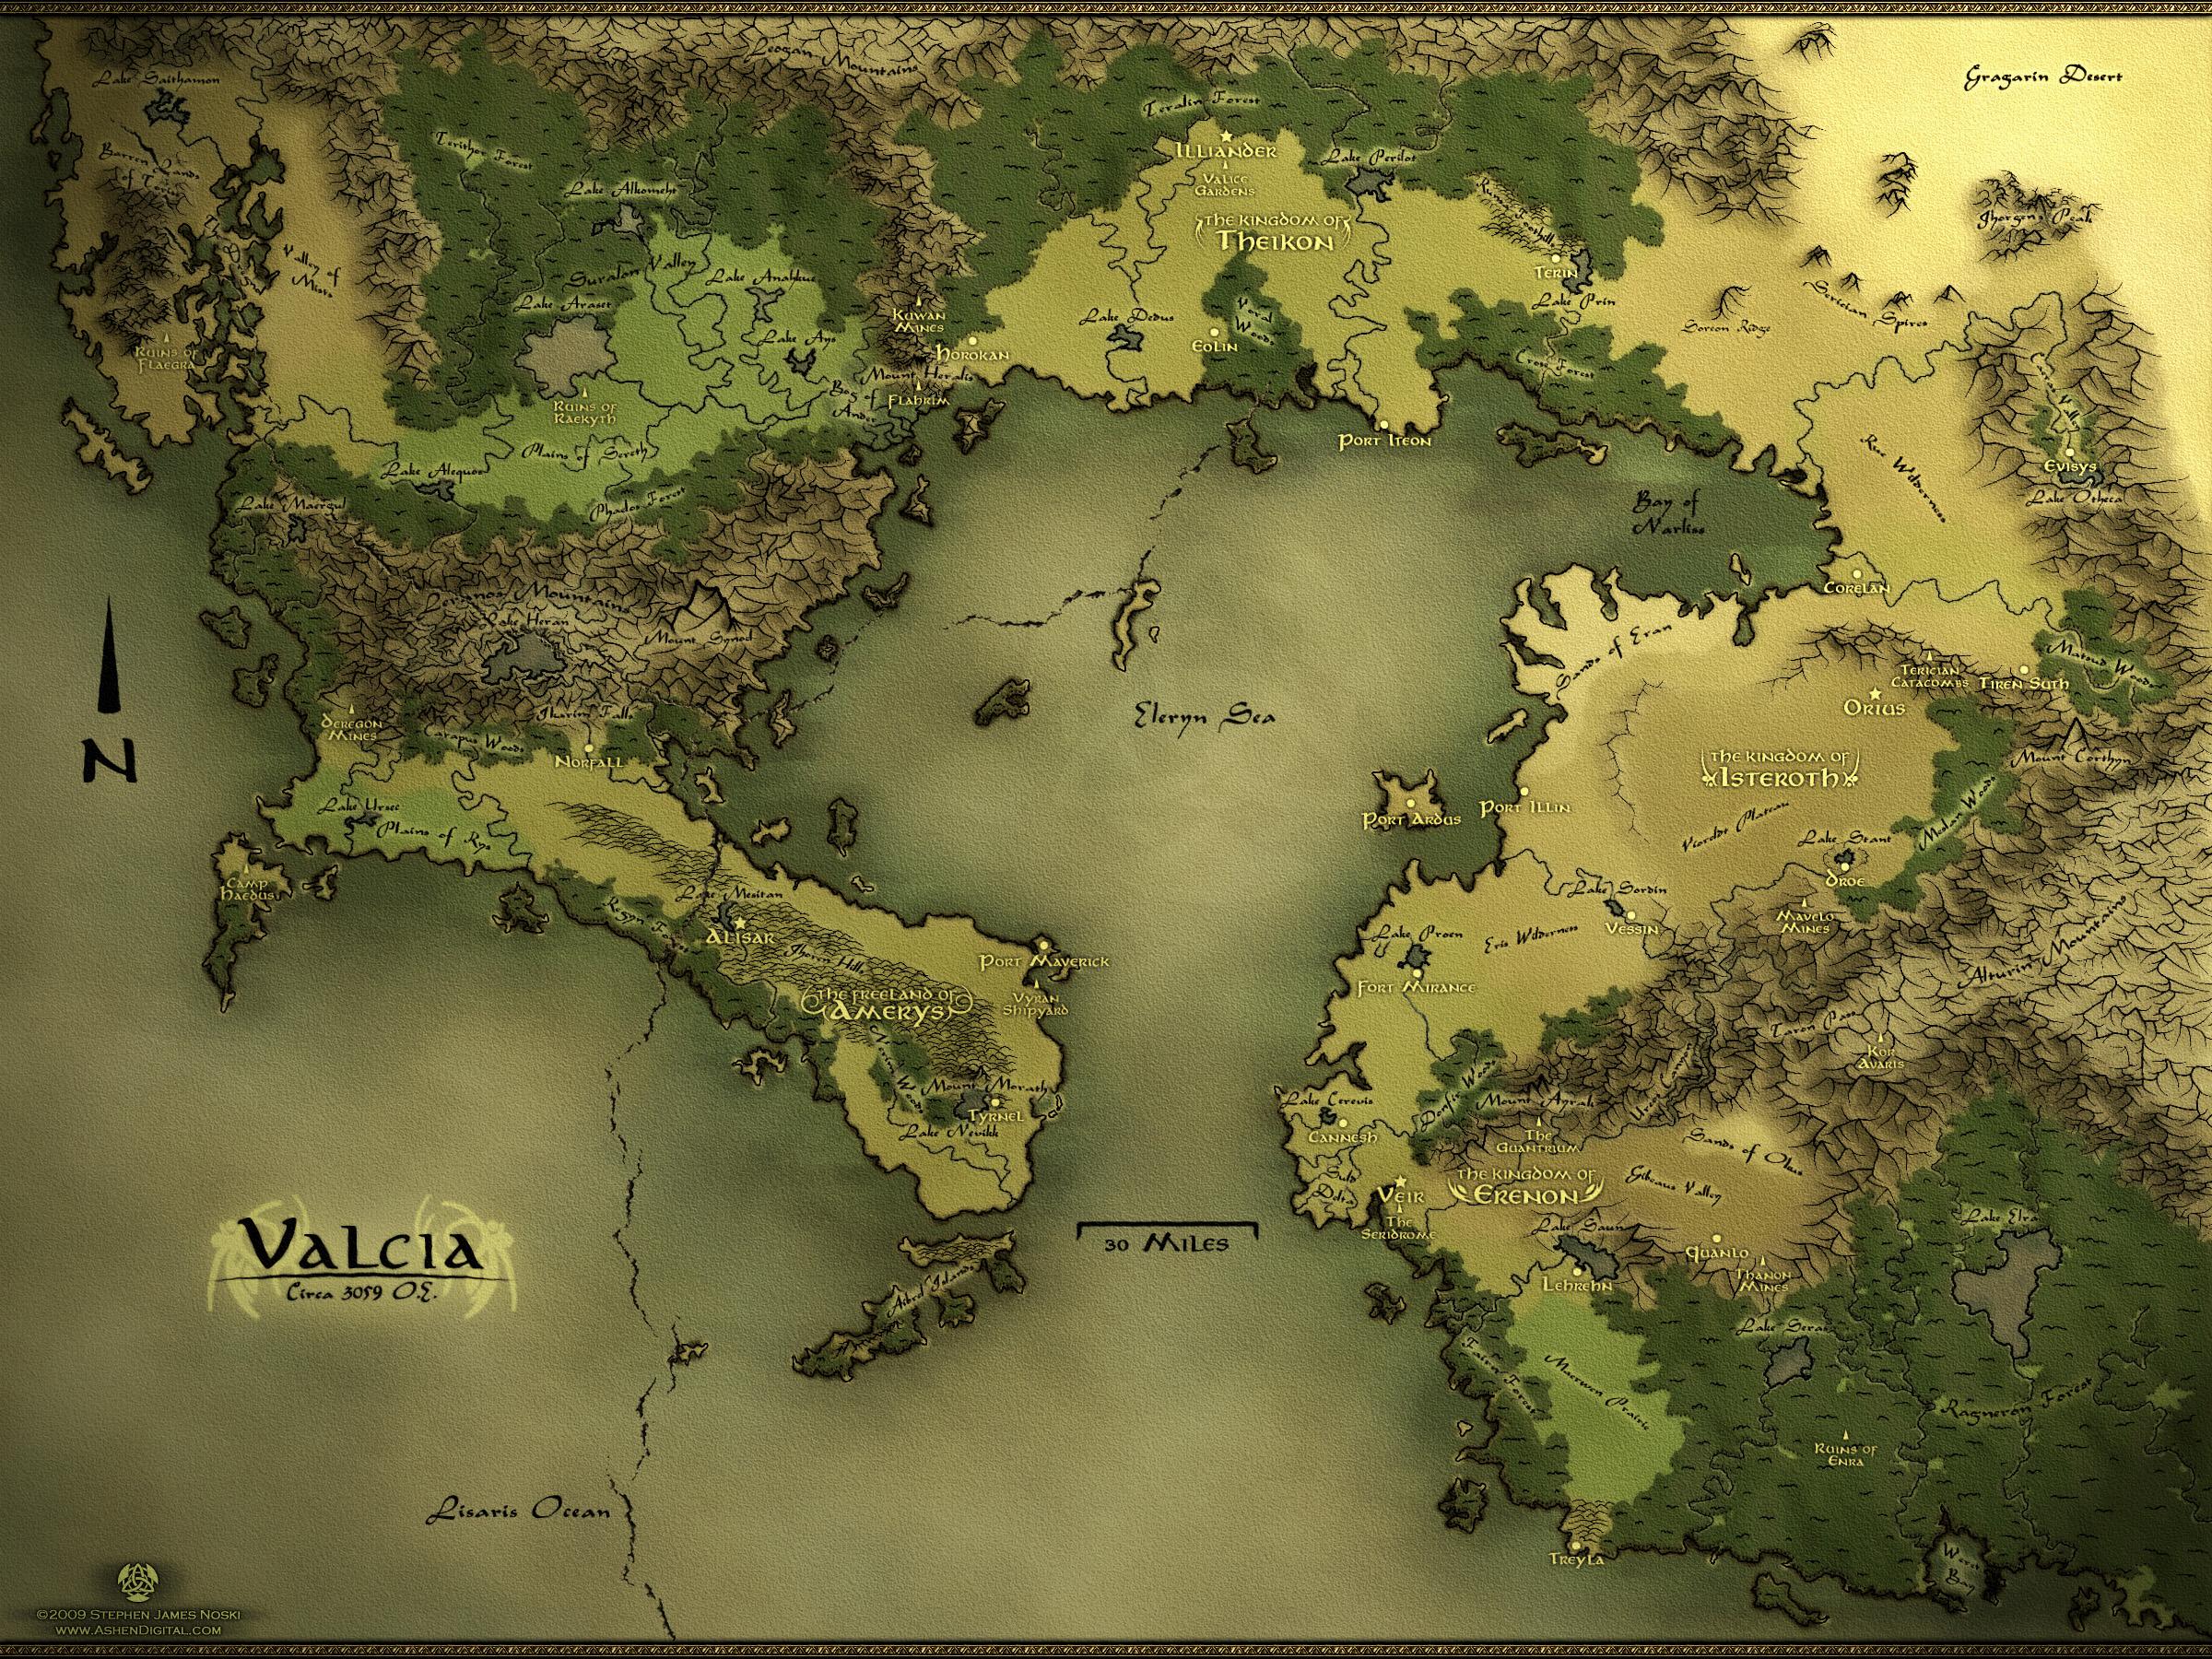 Valcia Regional Fantasy Map by Authsauce on DeviantArt